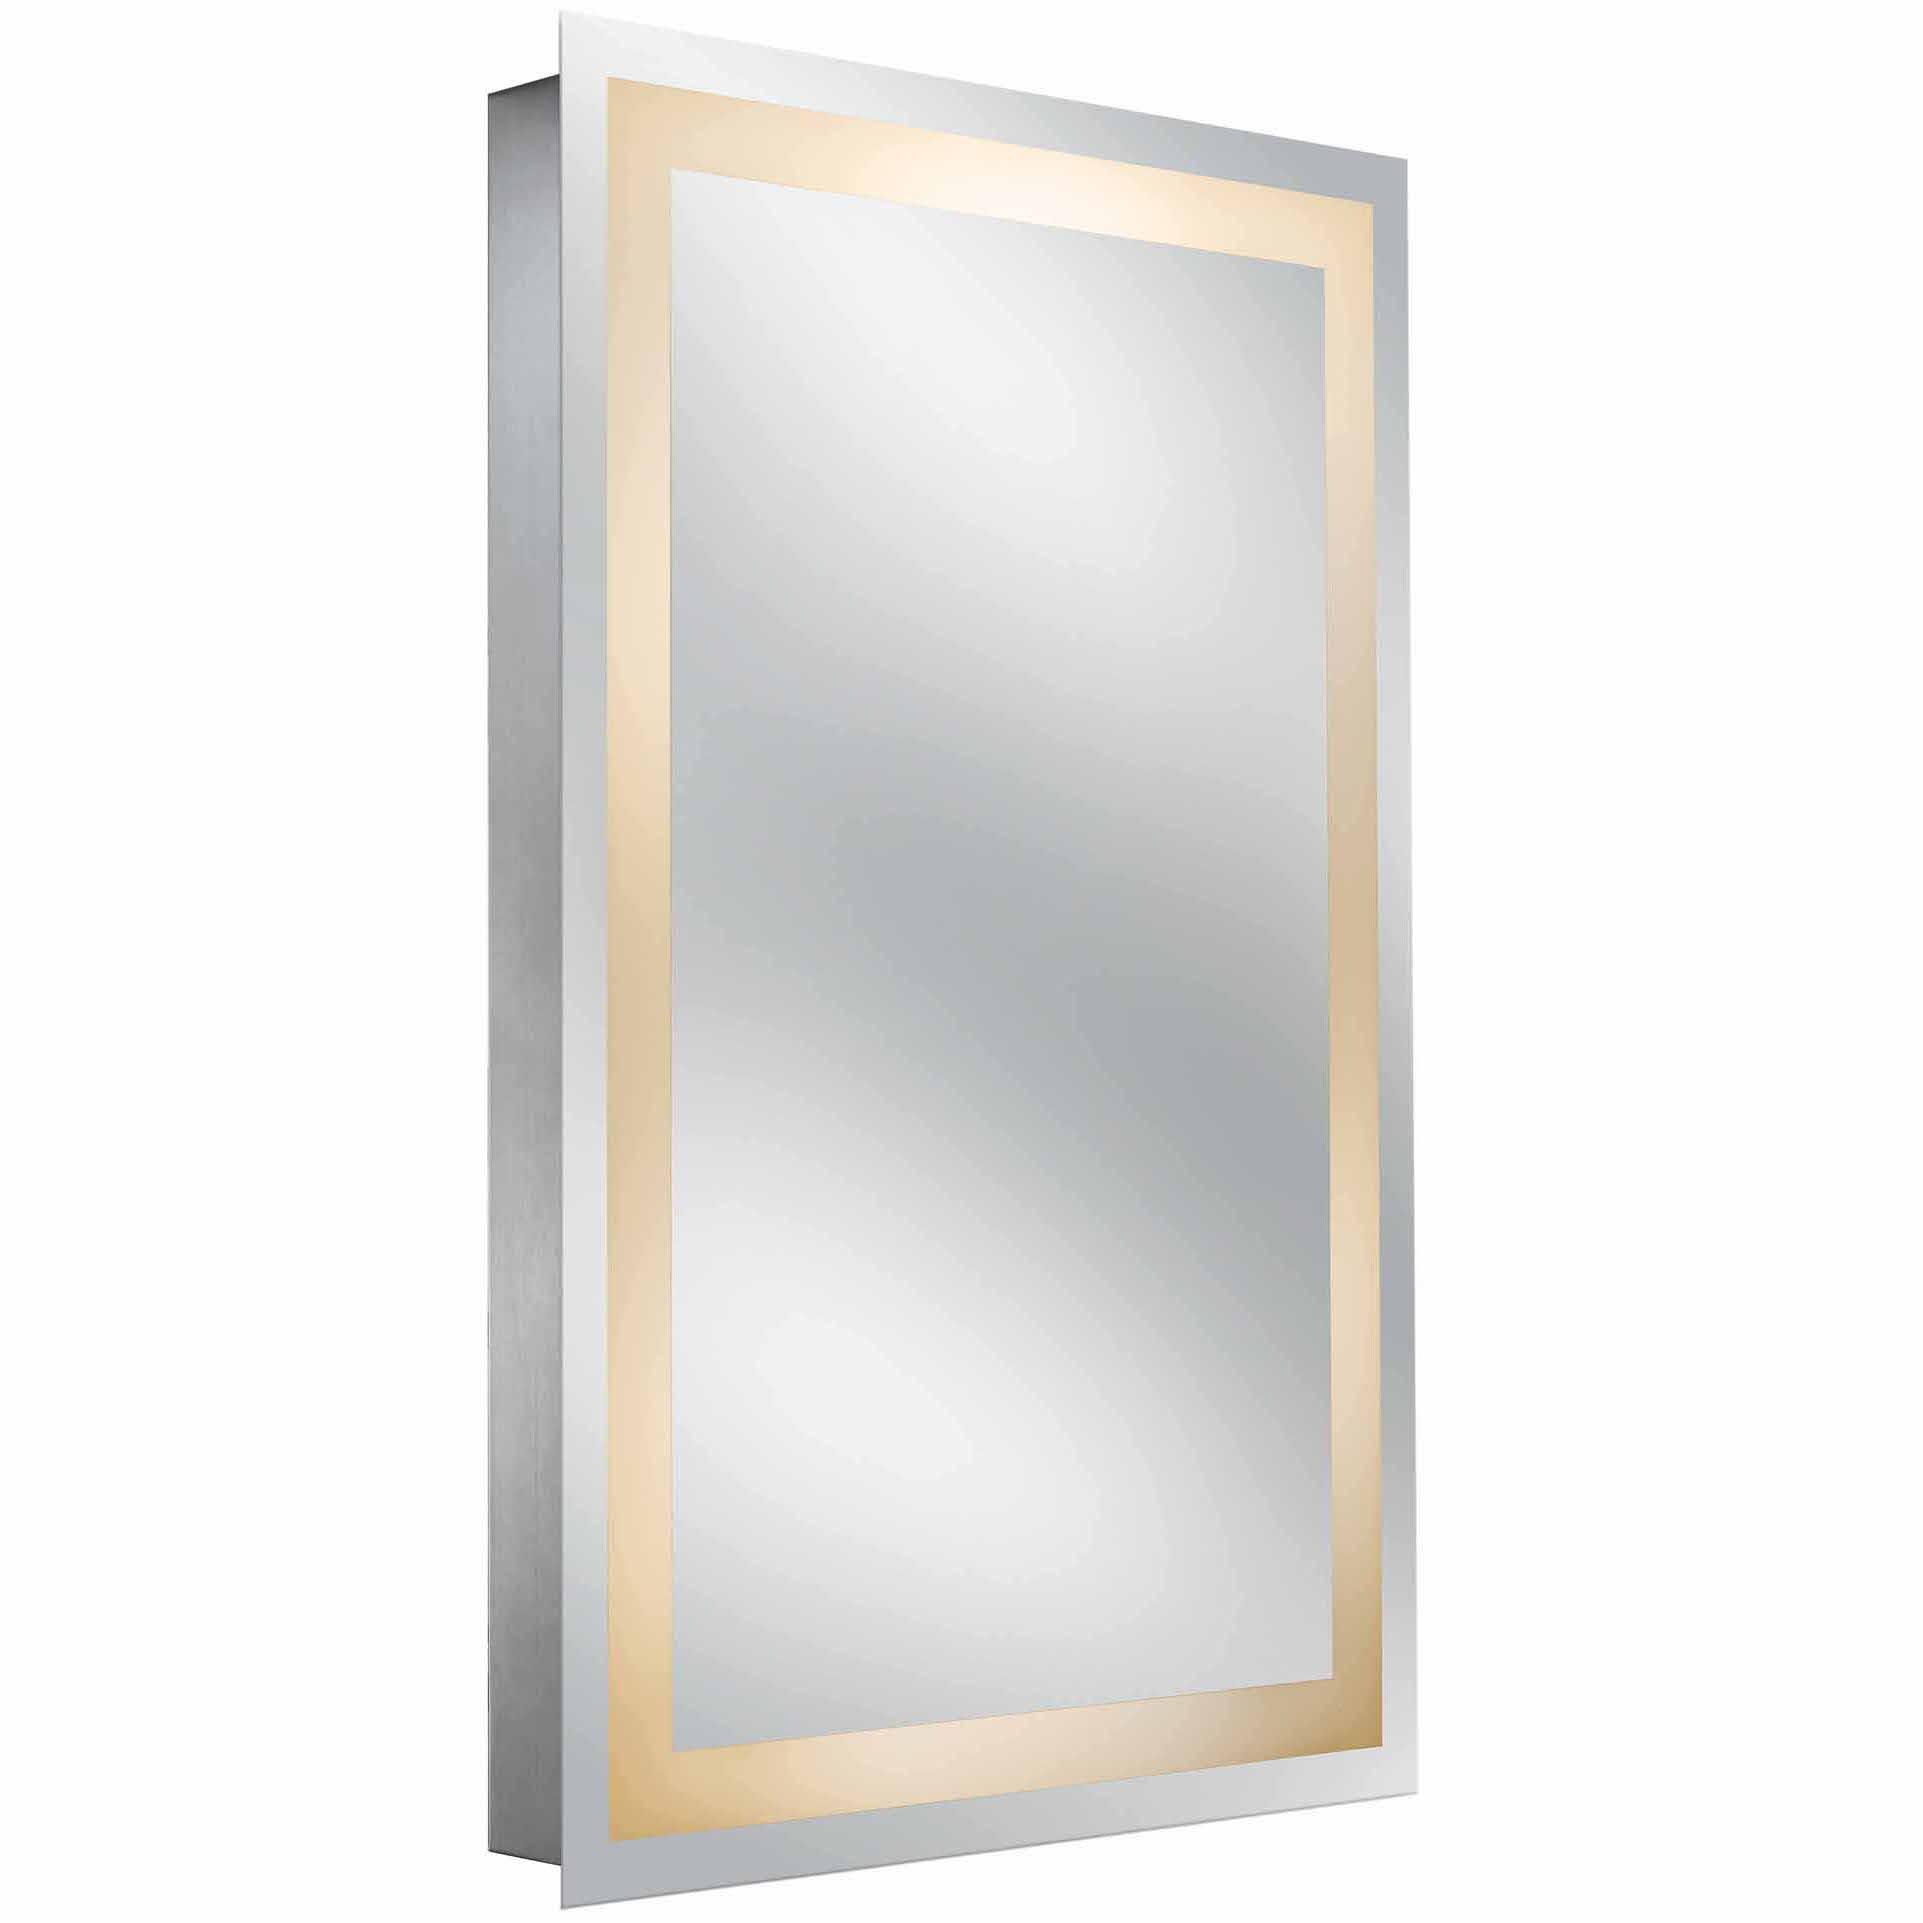 Kimball and Young Classic Border Backlit Mirror